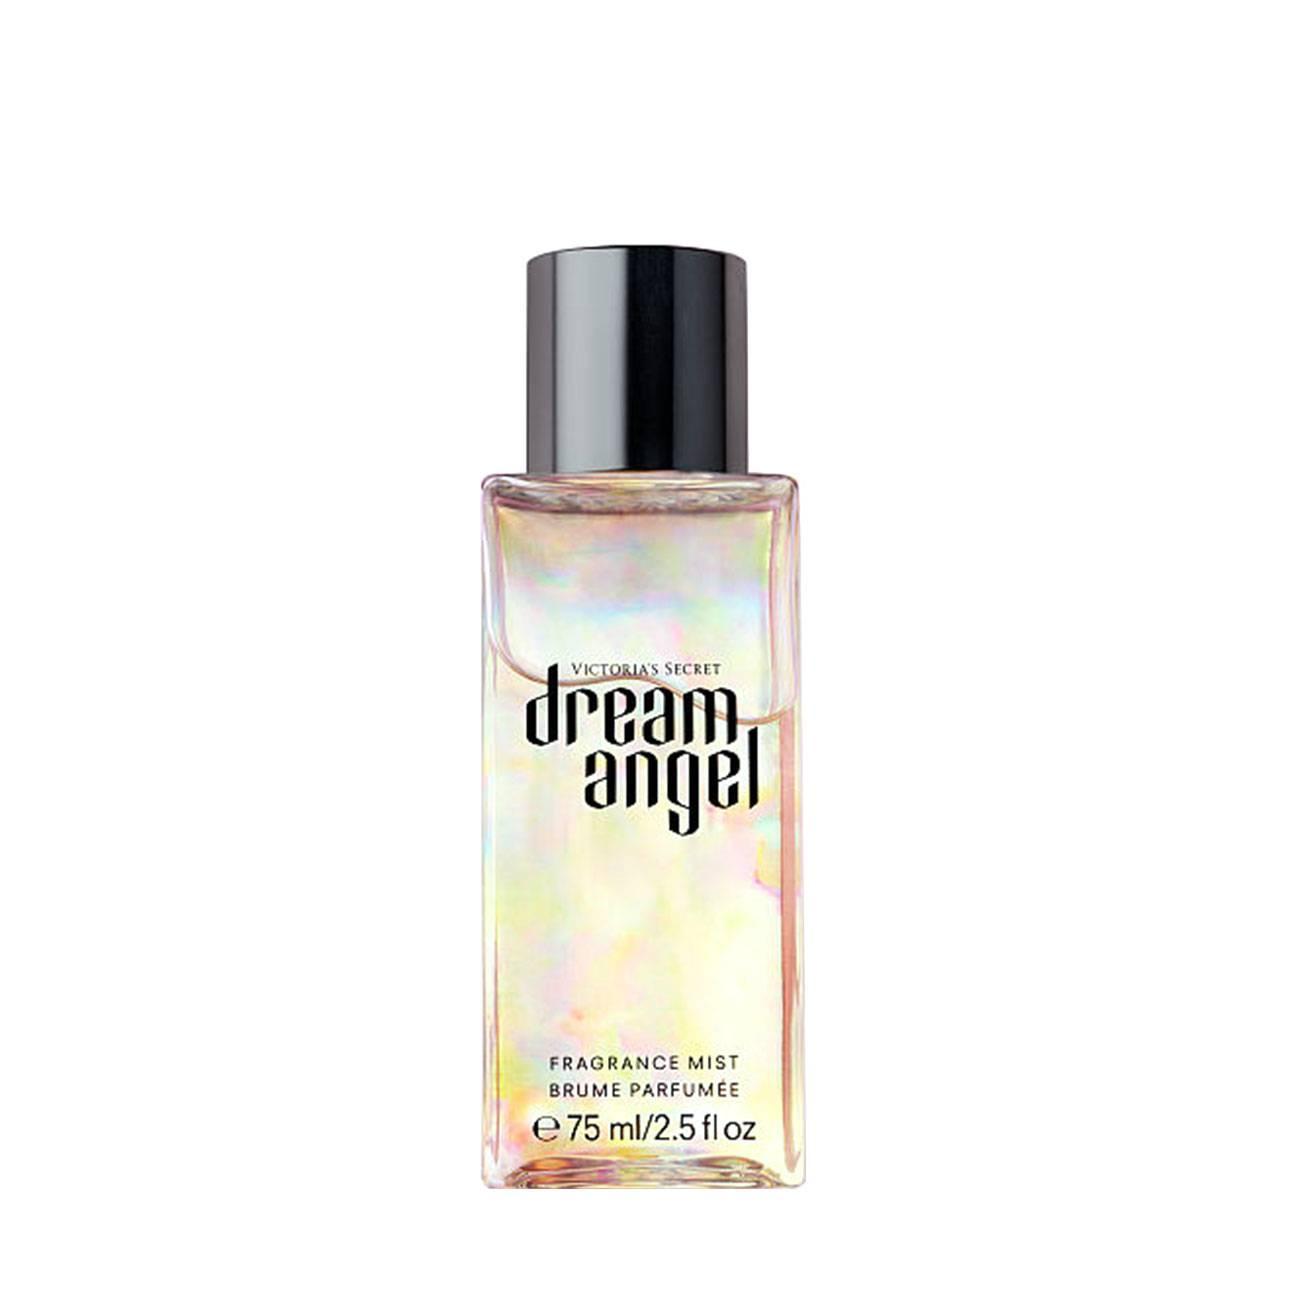 Dream Angel Travel Mist 75ml Victoria's Secret imagine 2021 bestvalue.eu